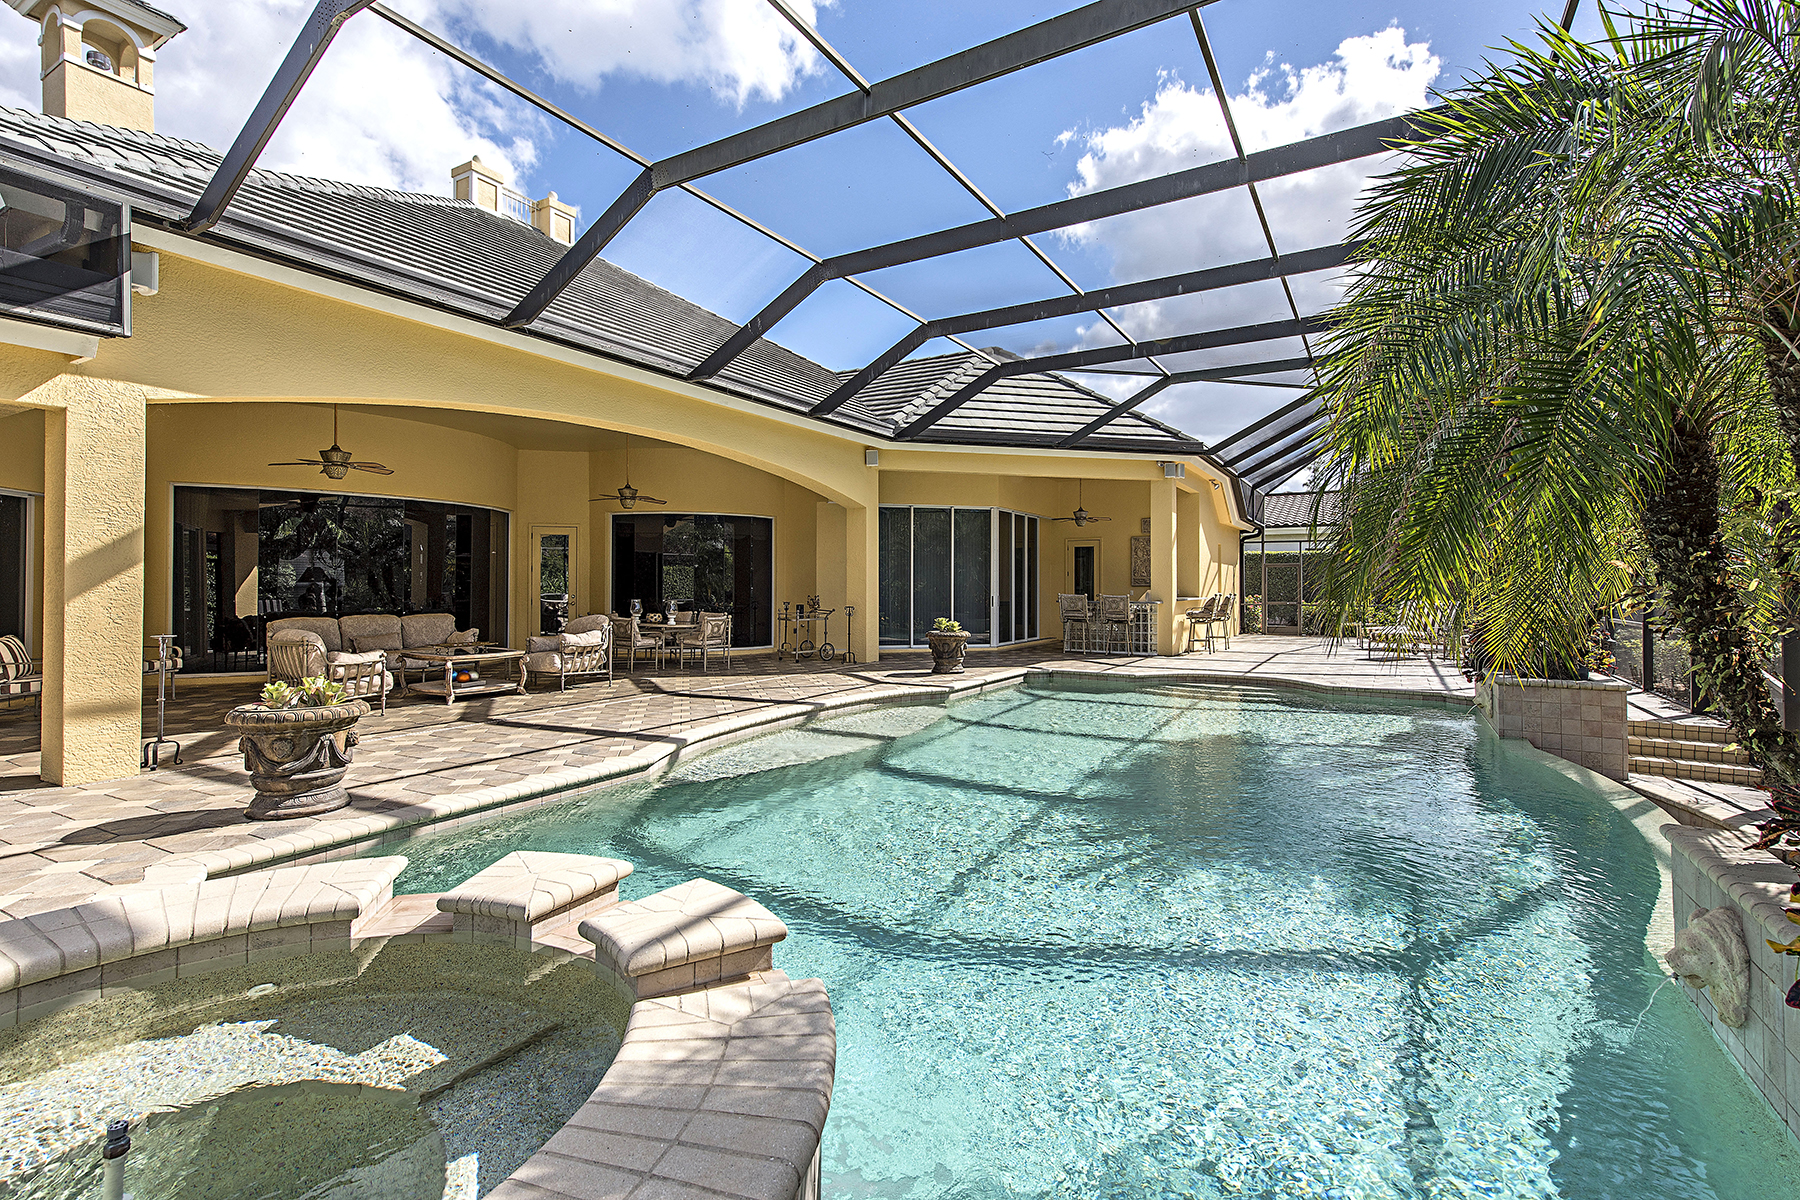 Single Family Home for Sale at PELICAN MARSH - BAY LAUREL ESTATES 8707 Purslane Dr, Naples, Florida 34109 United States